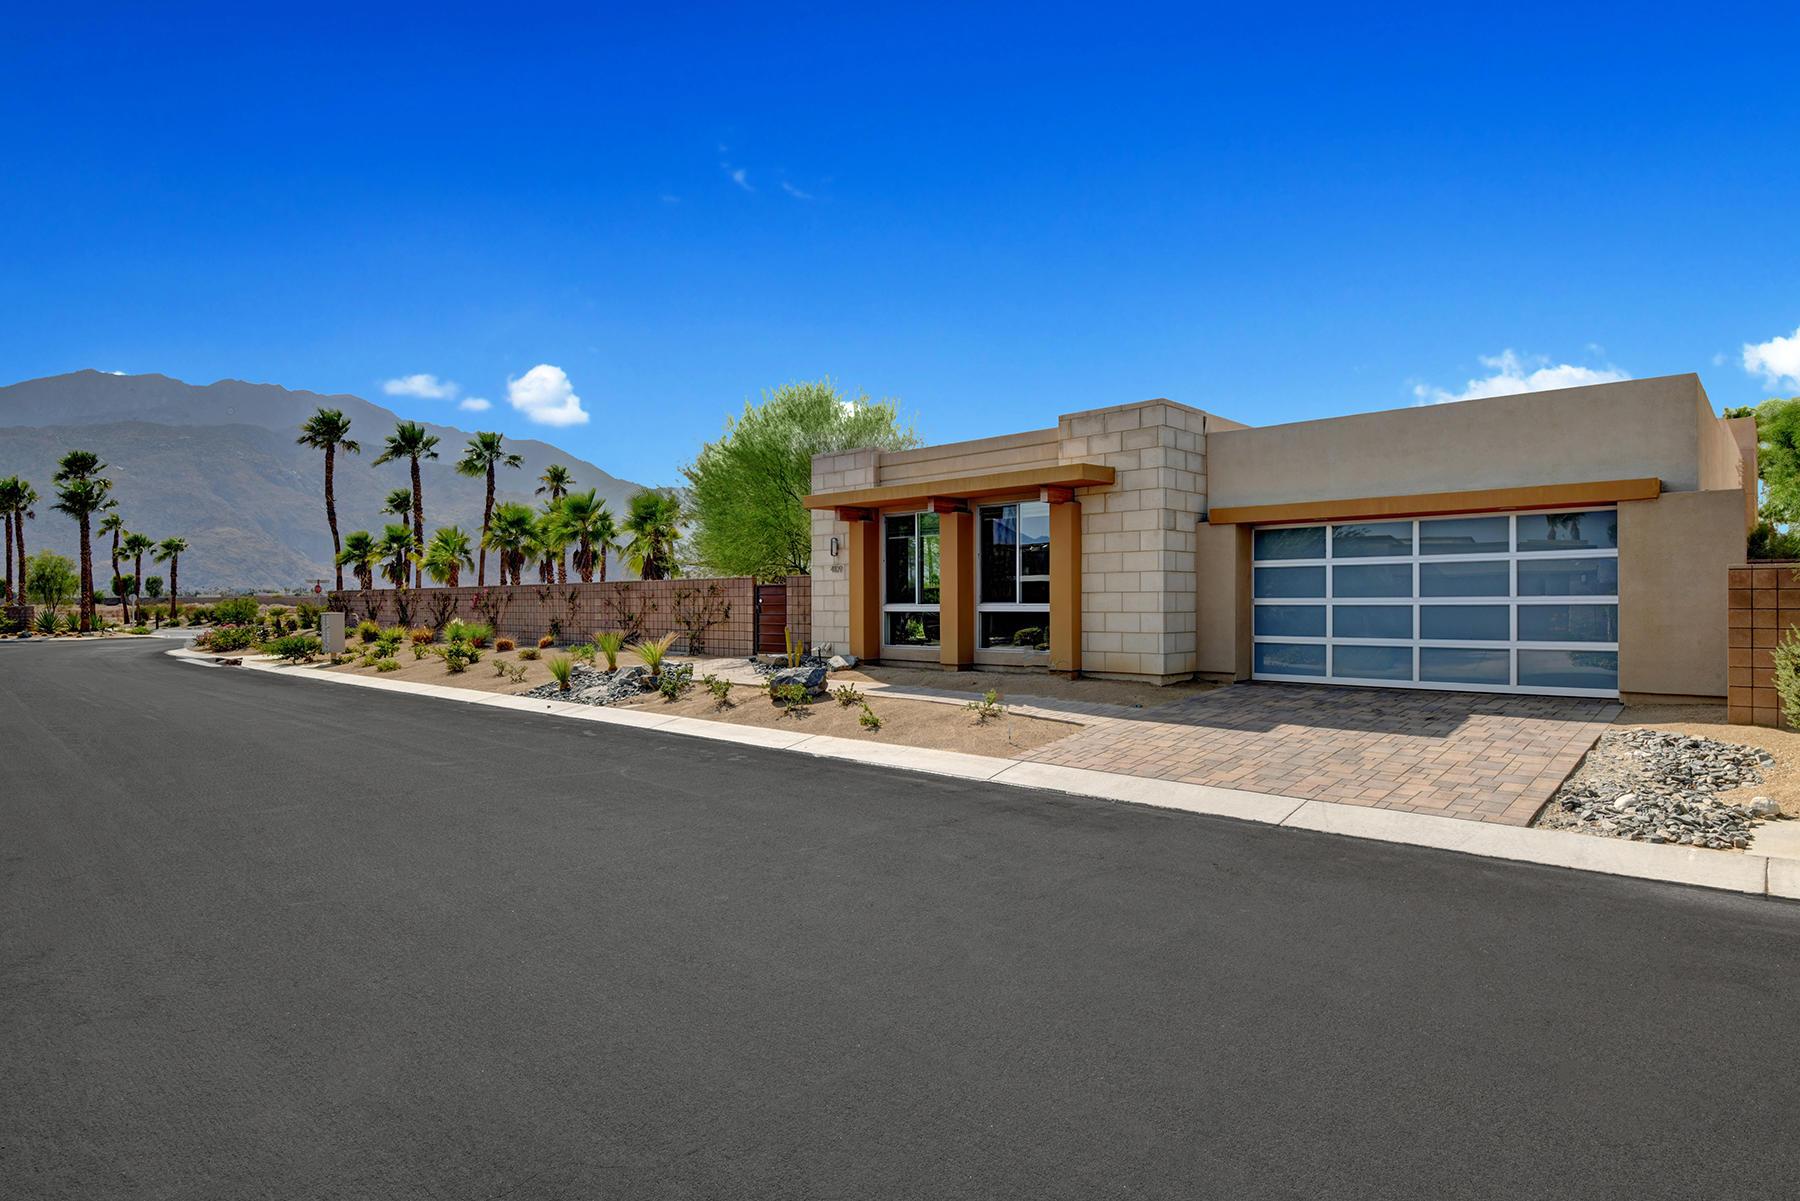 Photo of 4109 Indigo Street, Palm Springs, CA 92262